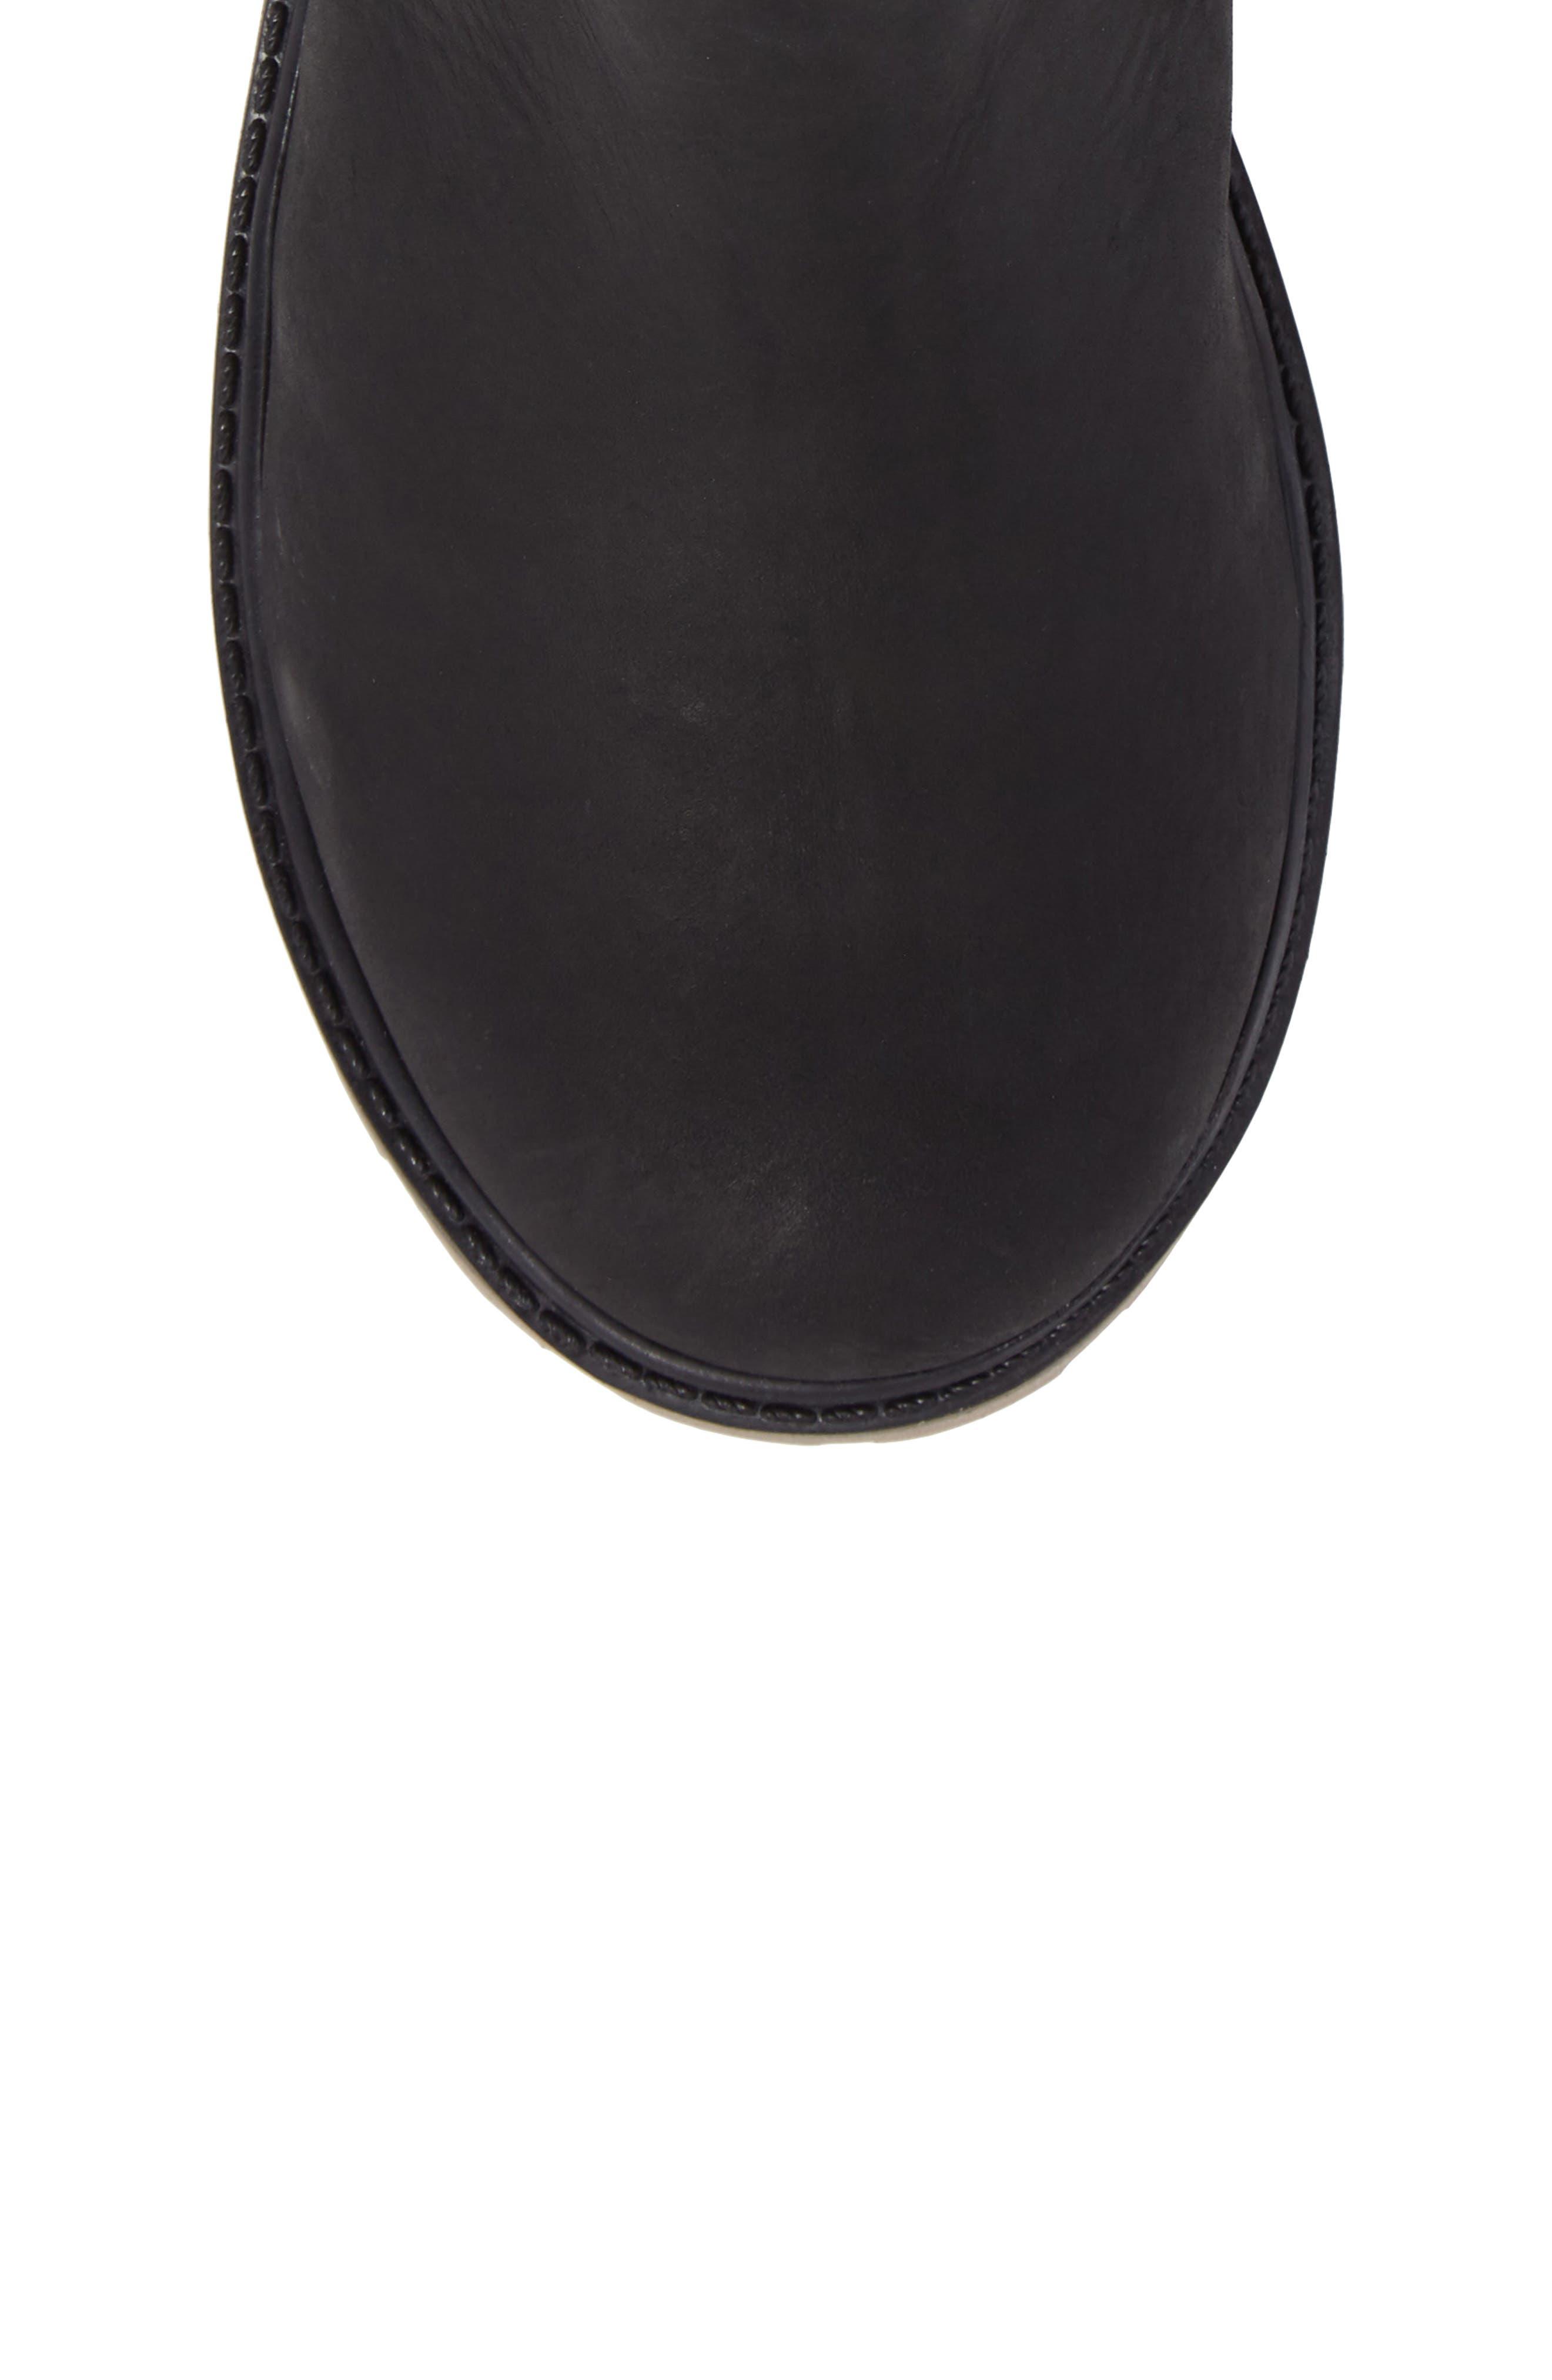 TakodaC Waterproof Chelsea Boot,                             Alternate thumbnail 5, color,                             Black